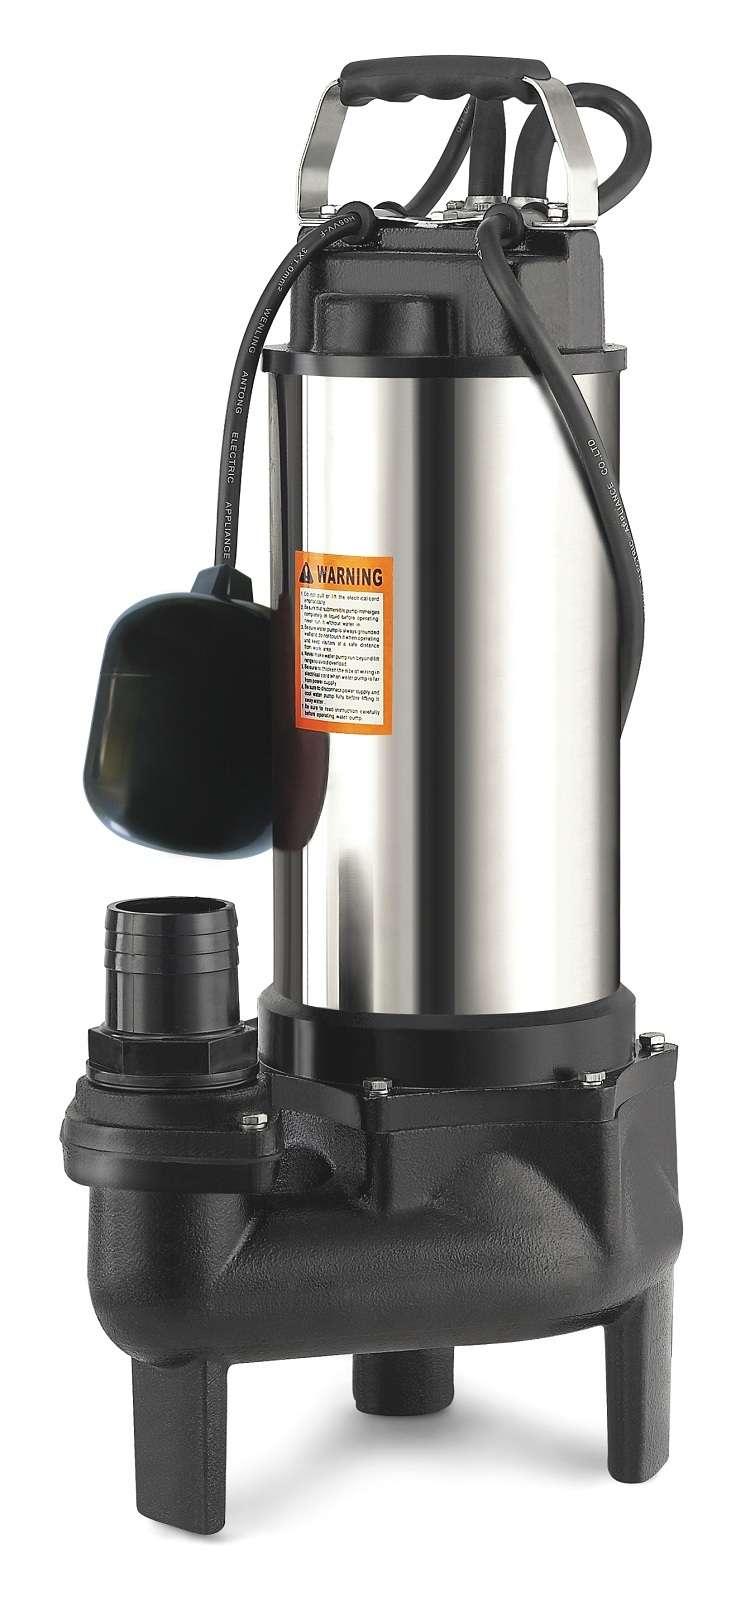 pompe eau vide cave roue vortex immerg e 1500w 31 m3 h ebay. Black Bedroom Furniture Sets. Home Design Ideas